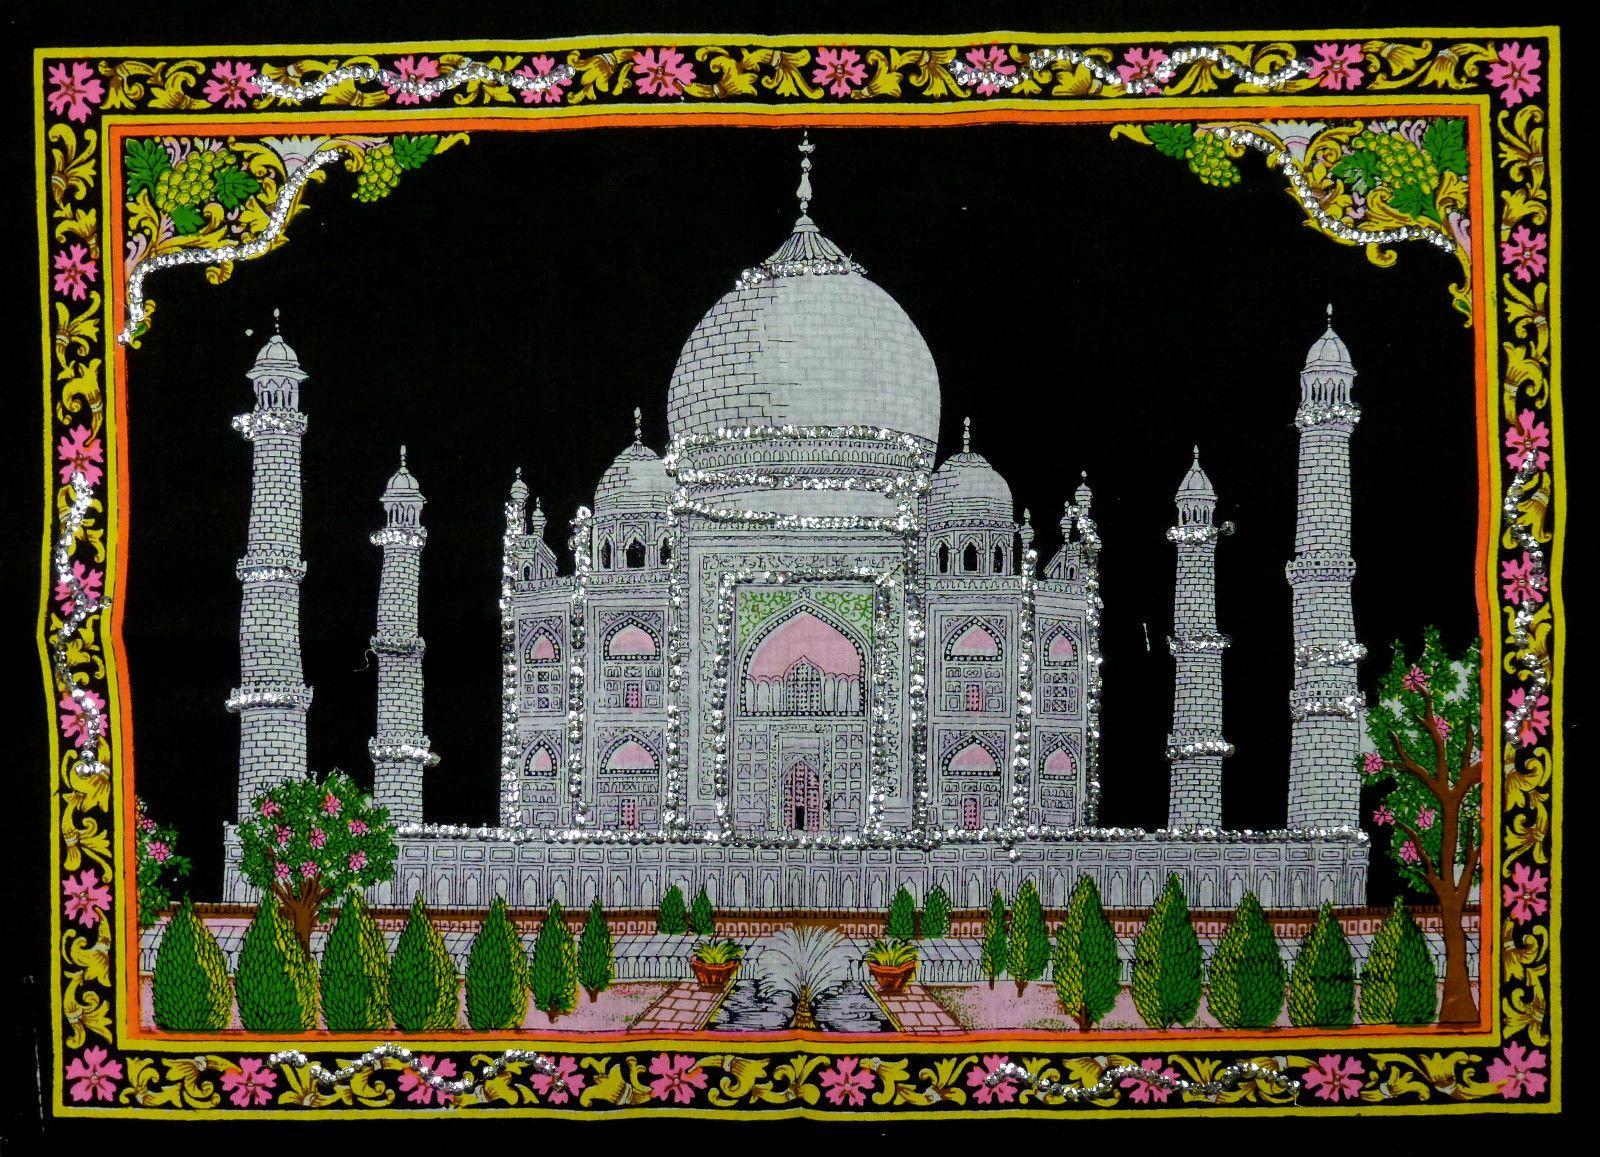 * Indian Taj Mahal Sequinned Wall Hanging * Fair Trade * Small | eBay